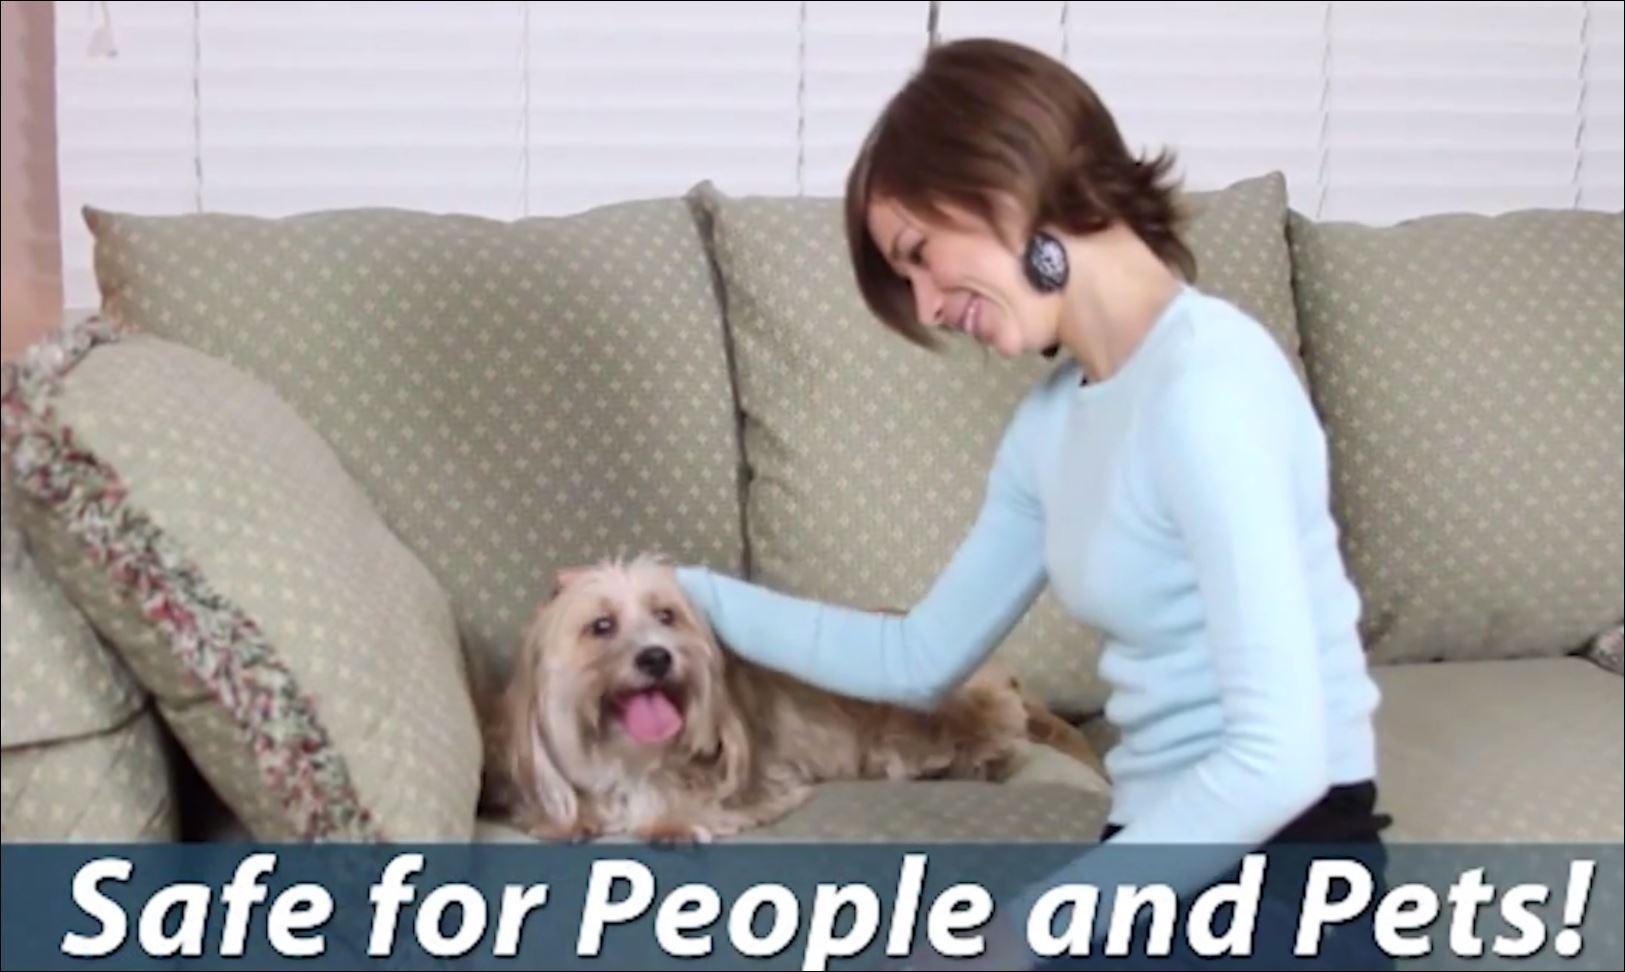 Earth Care Odor Eliminator For Carpets And Furniture